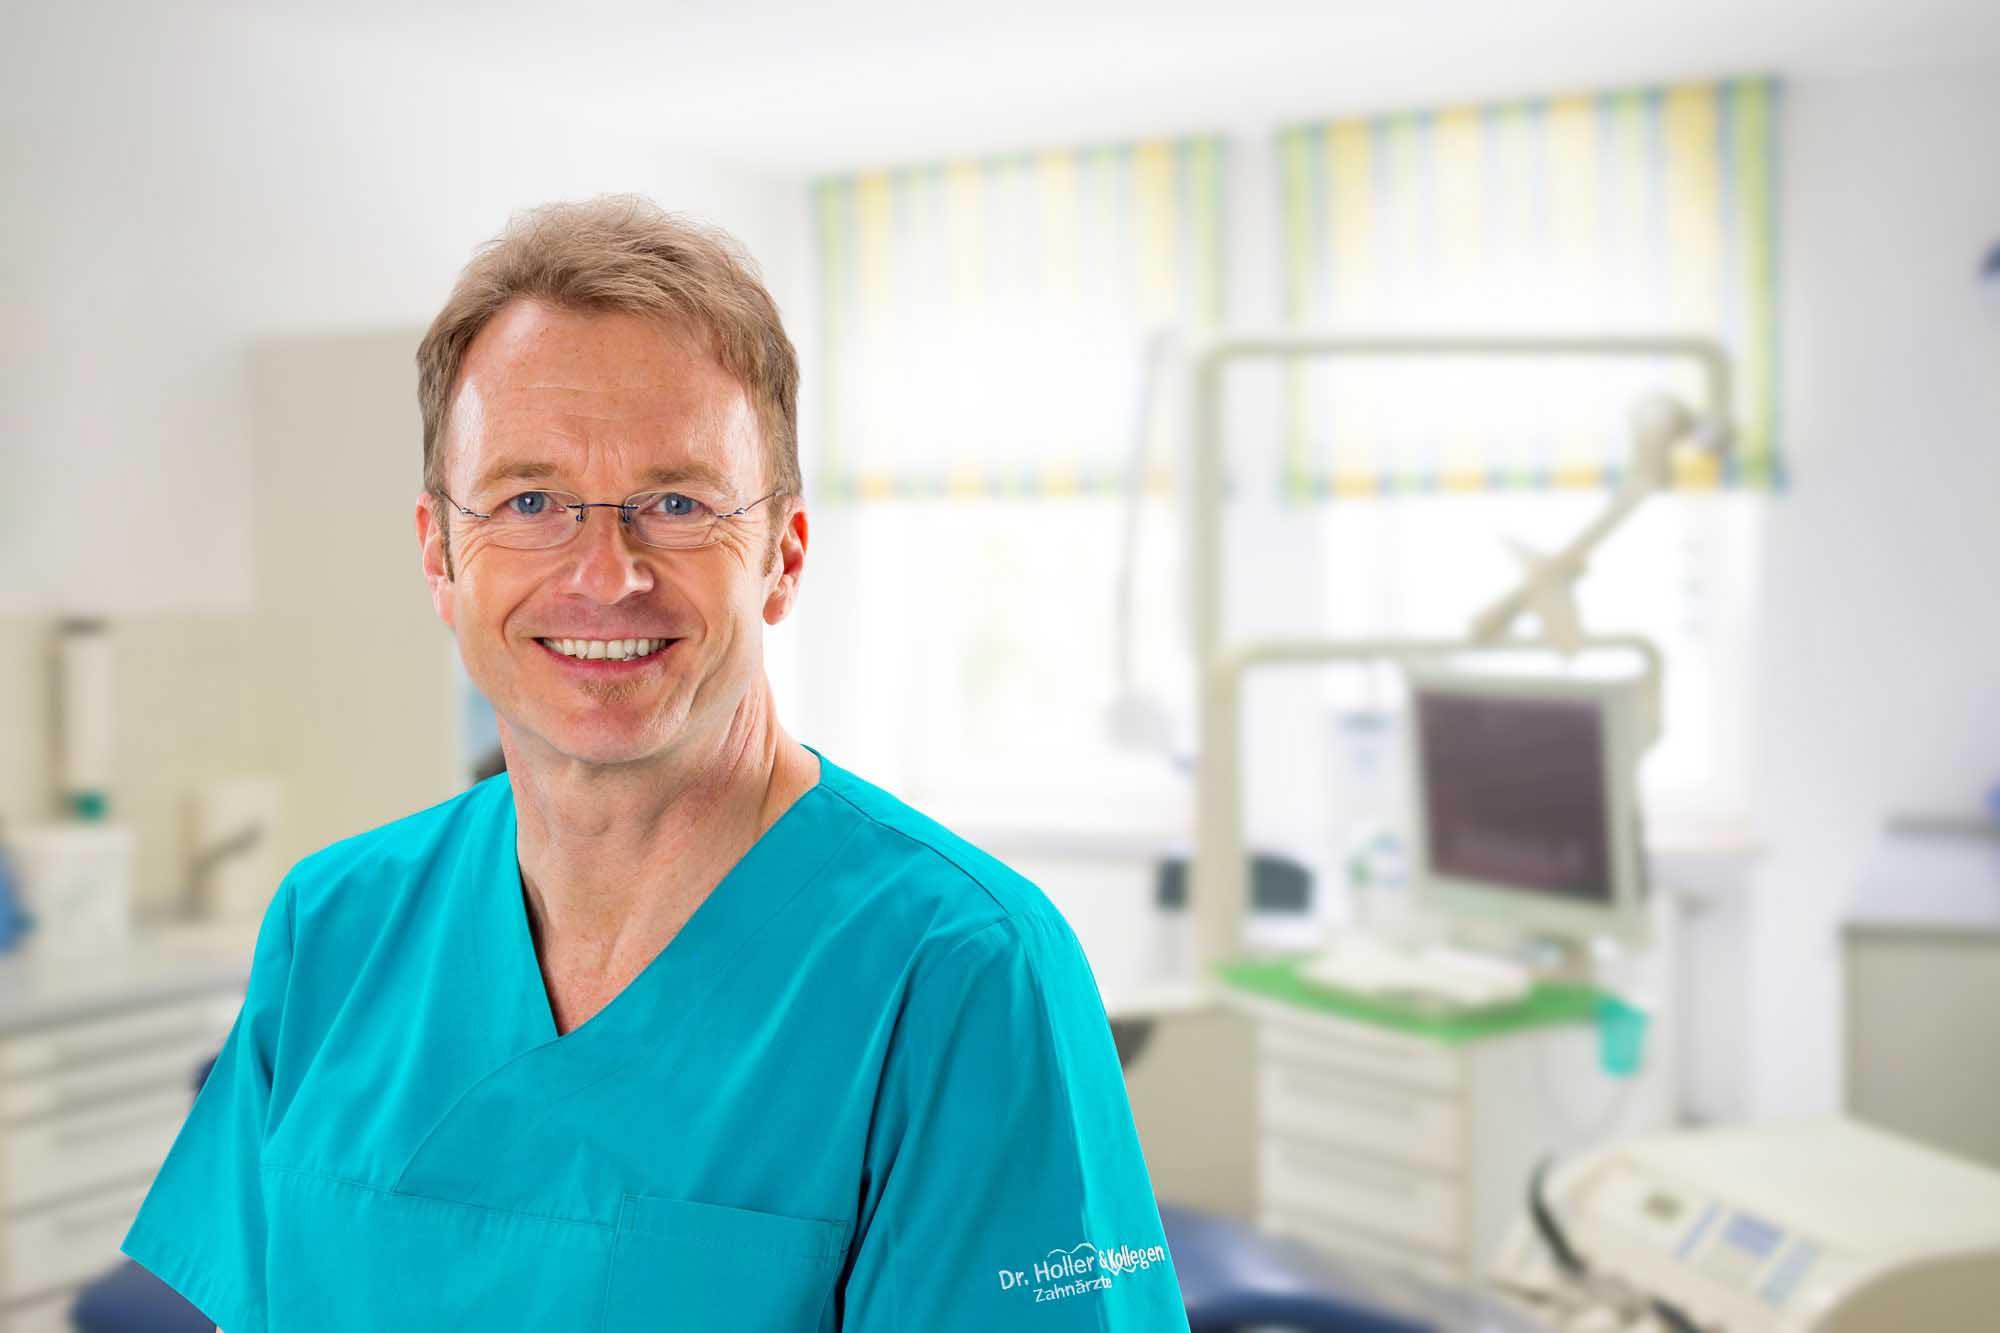 Dr. Harald Kubik